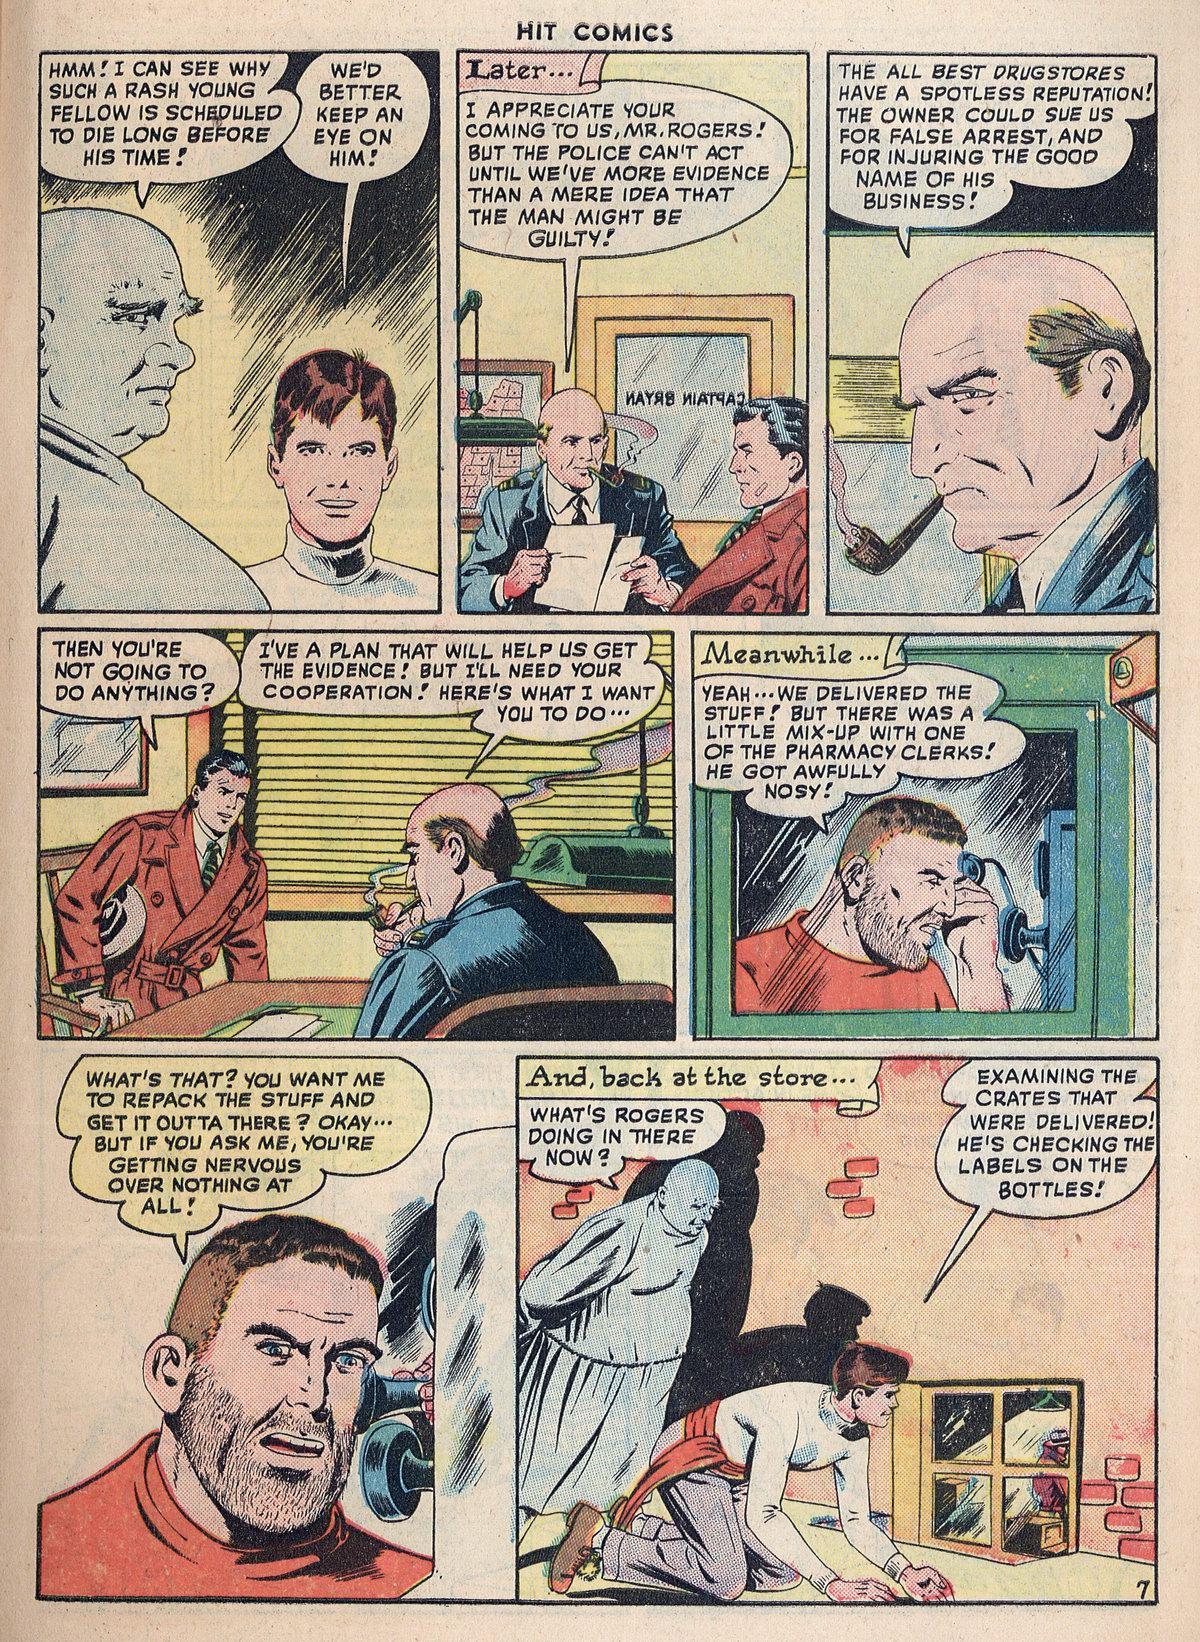 Read online Hit Comics comic -  Issue #55 - 9